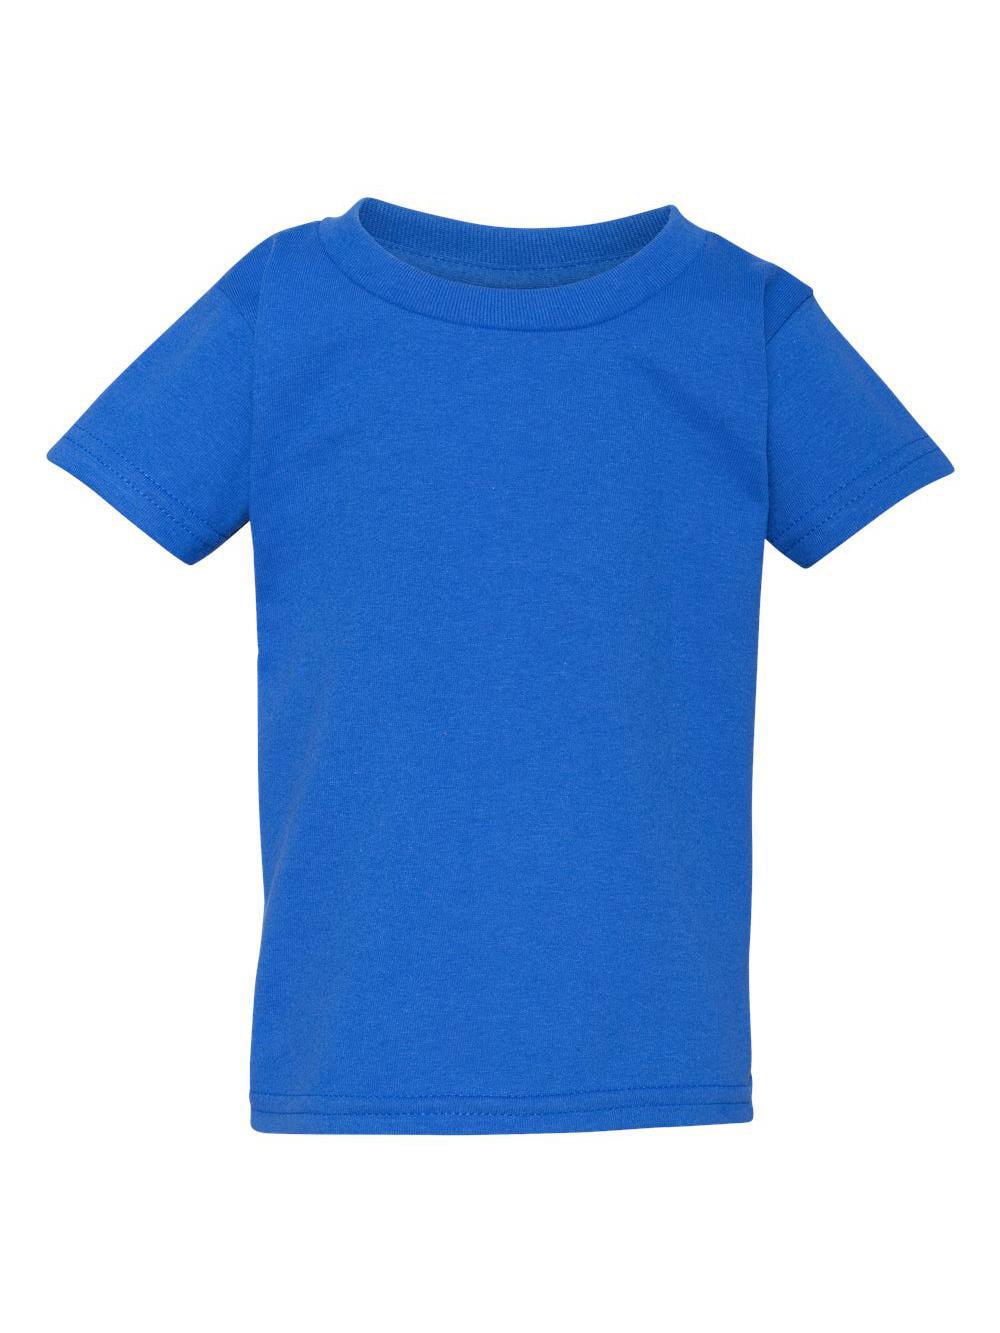 Gildan 5100P Toddler Heavy Cotton T-Shirt